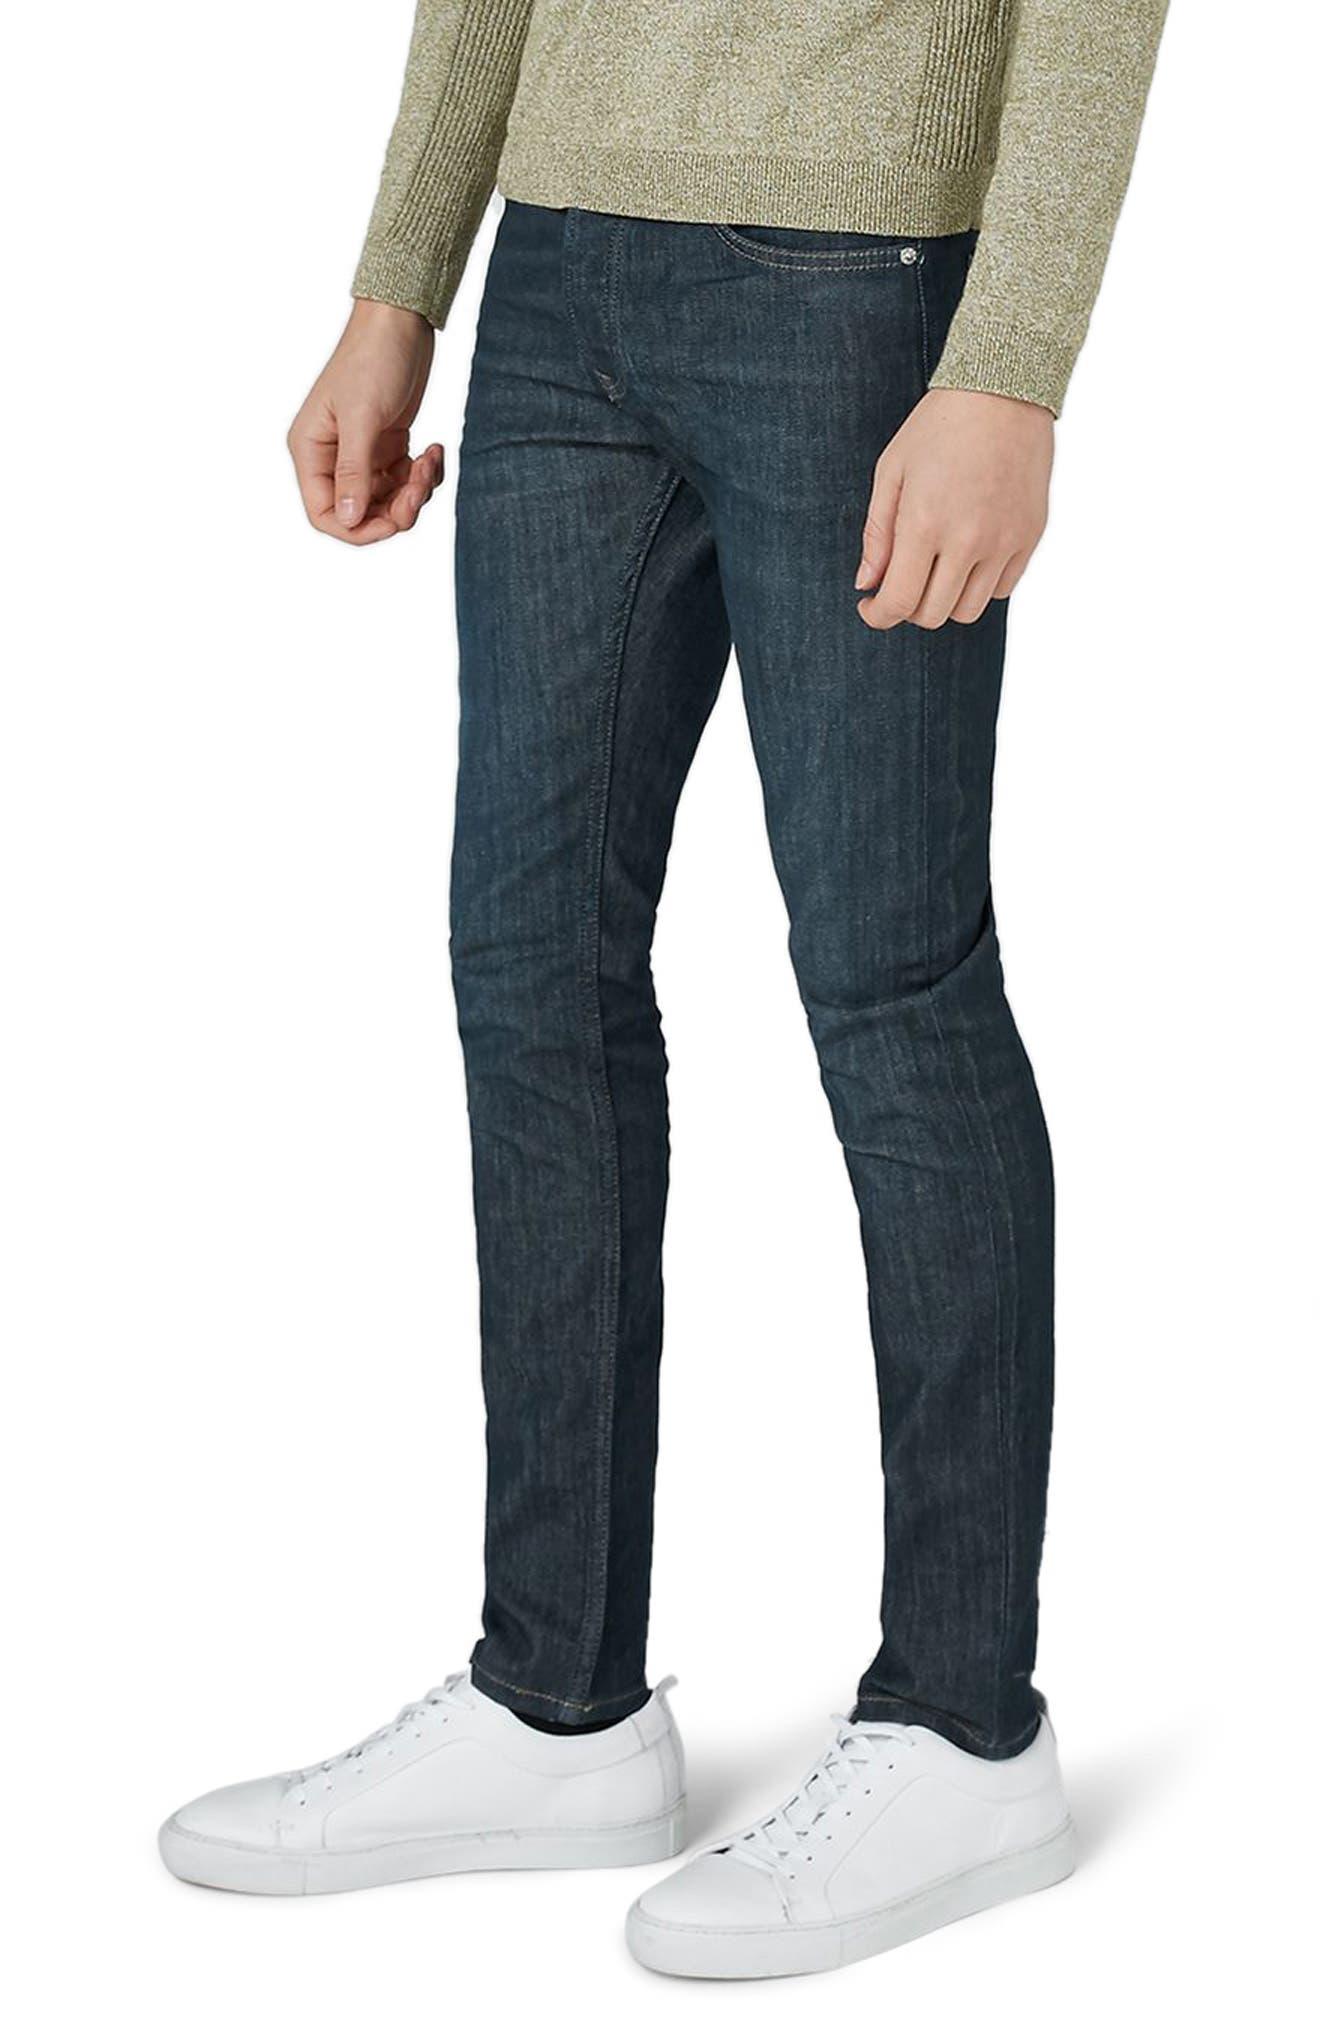 Coated Denim Skinny Jeans,                         Main,                         color, Blue